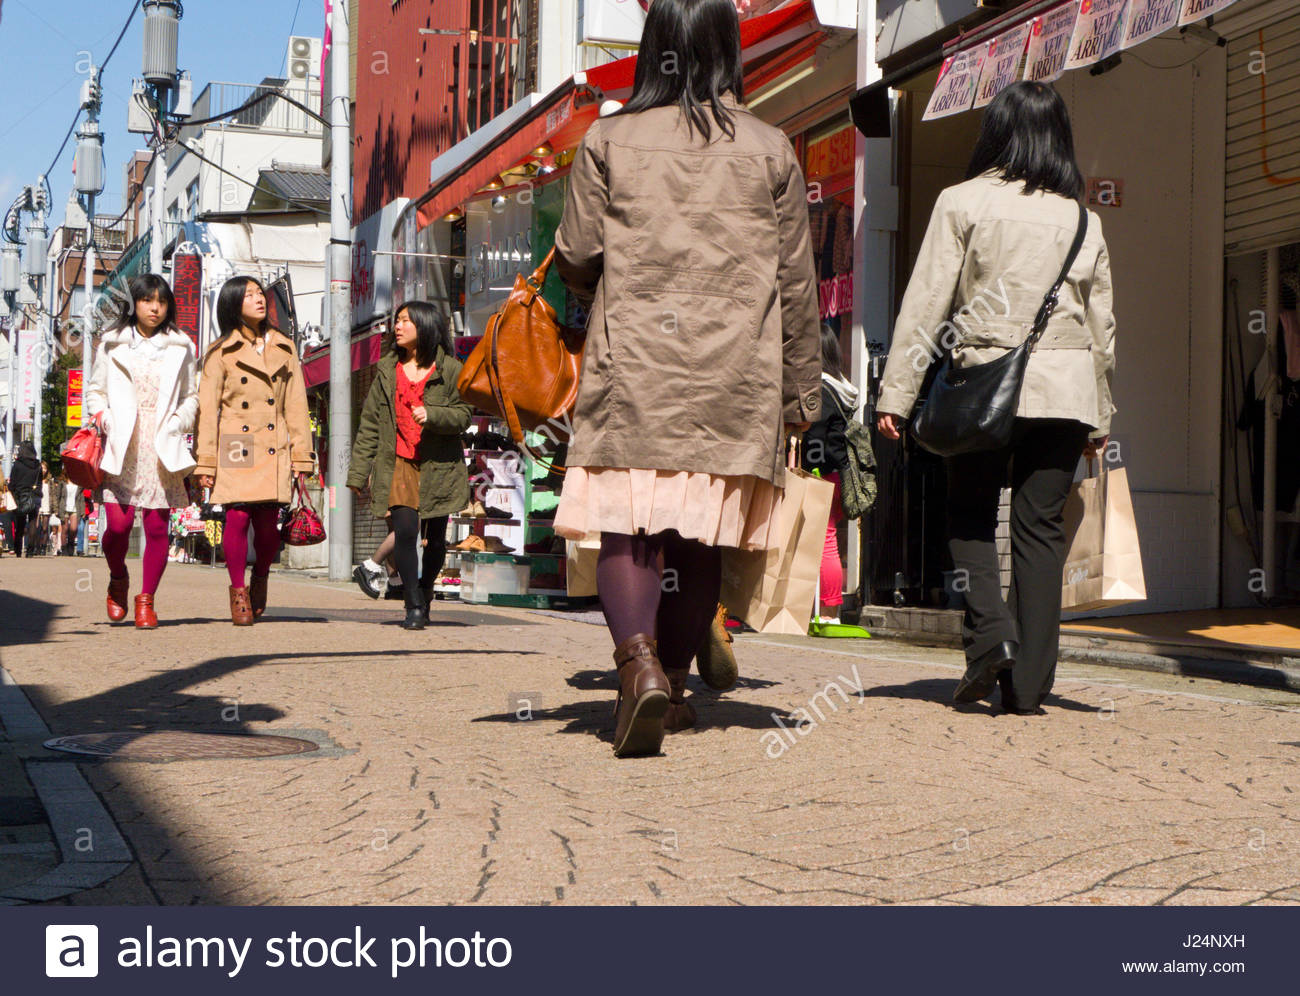 fukui single asian girls Meet thousands of beautiful single women online seeking men for dating, love, marriage in japan.